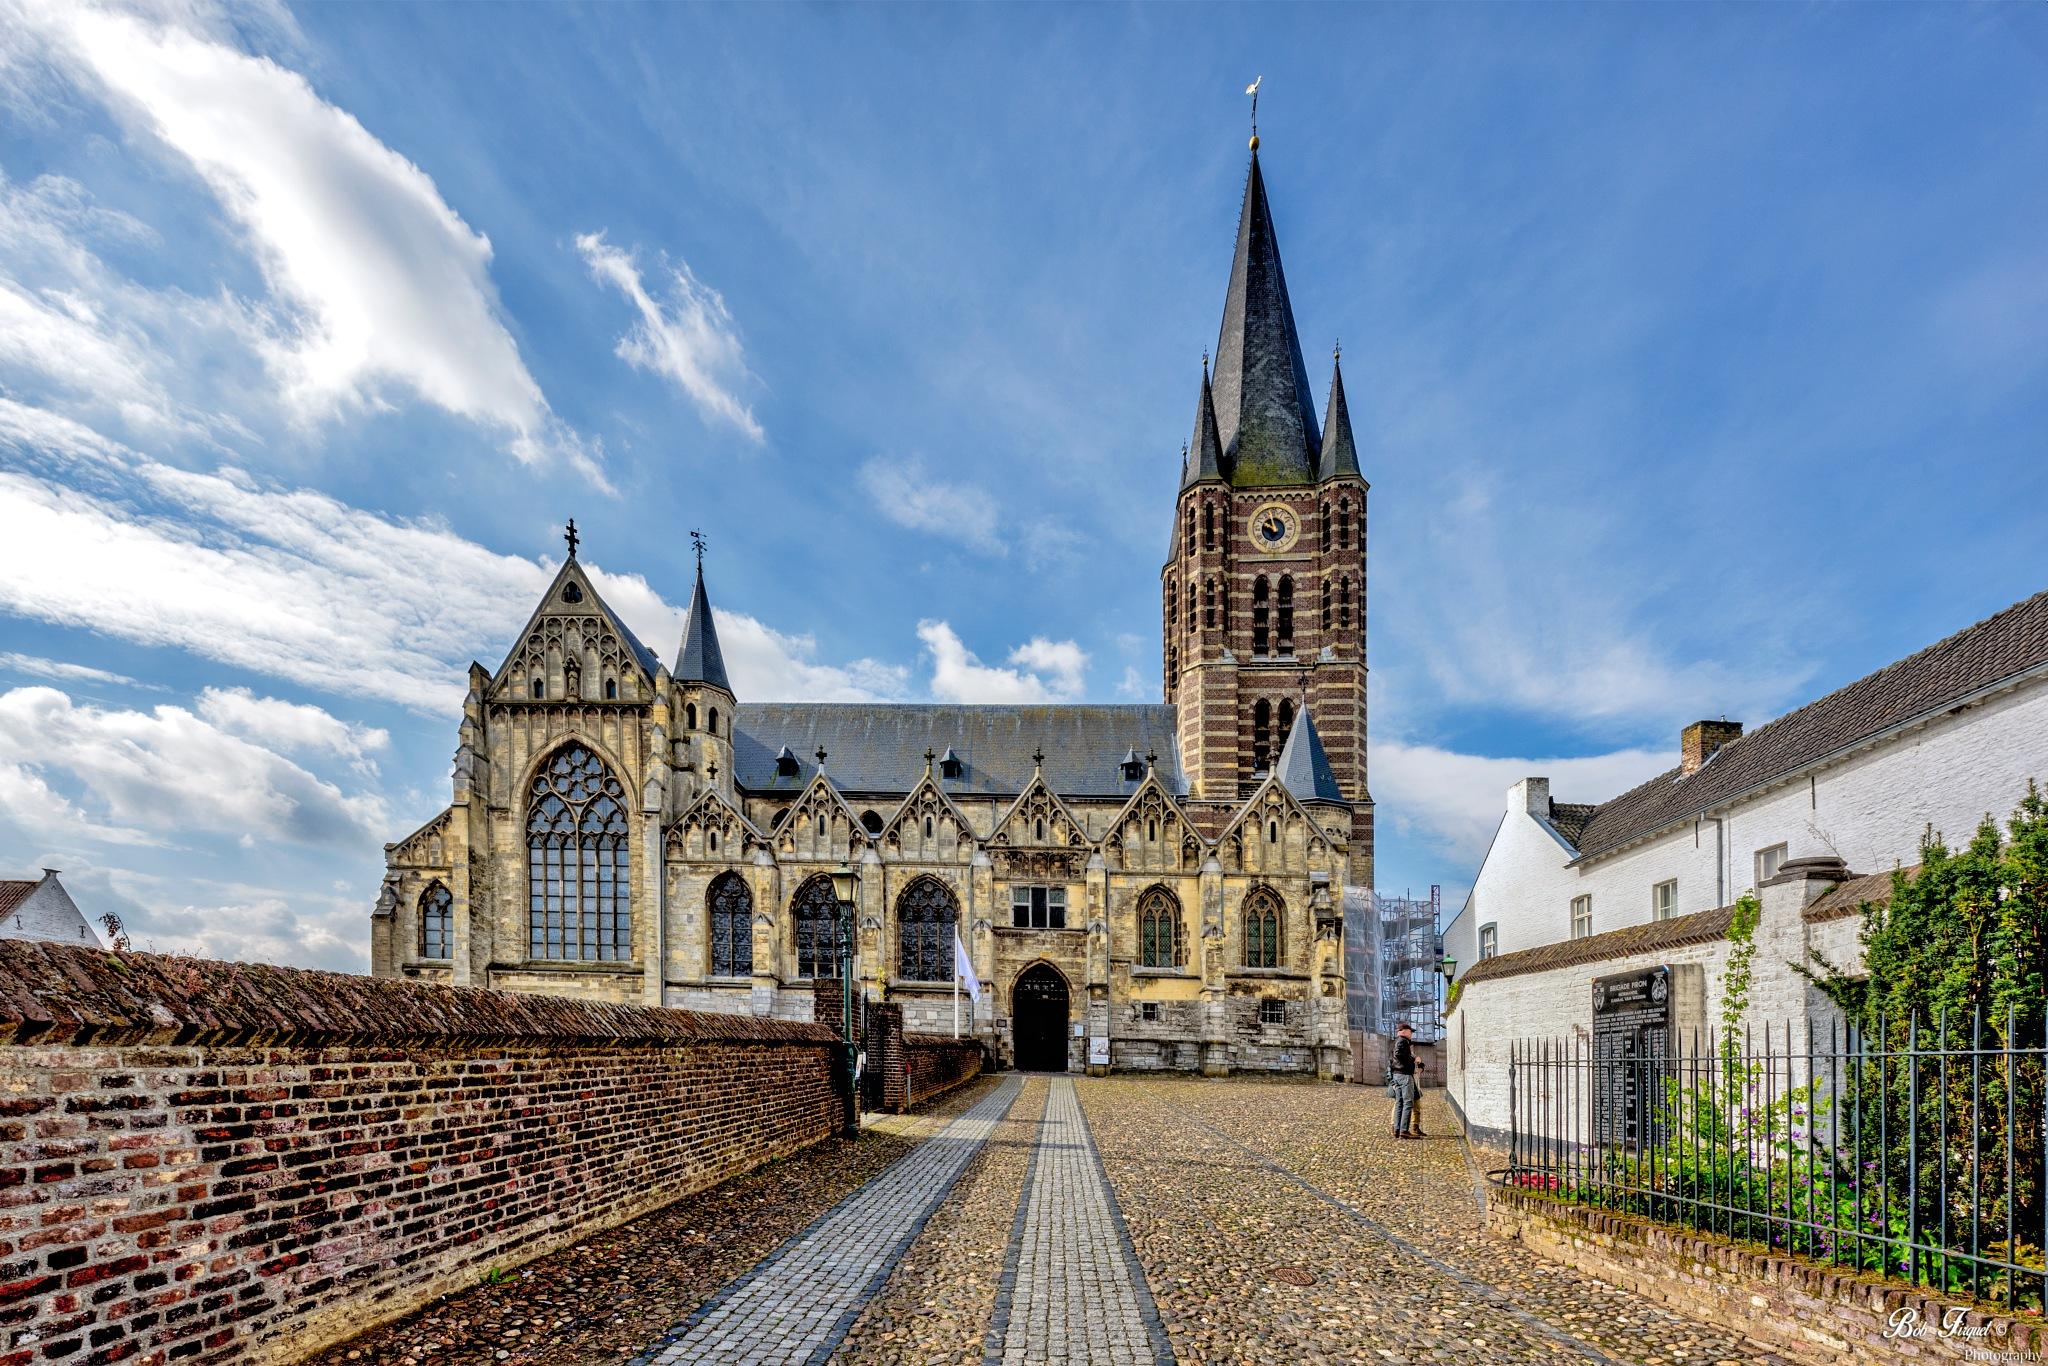 Church of  thorn by Bob Firquet